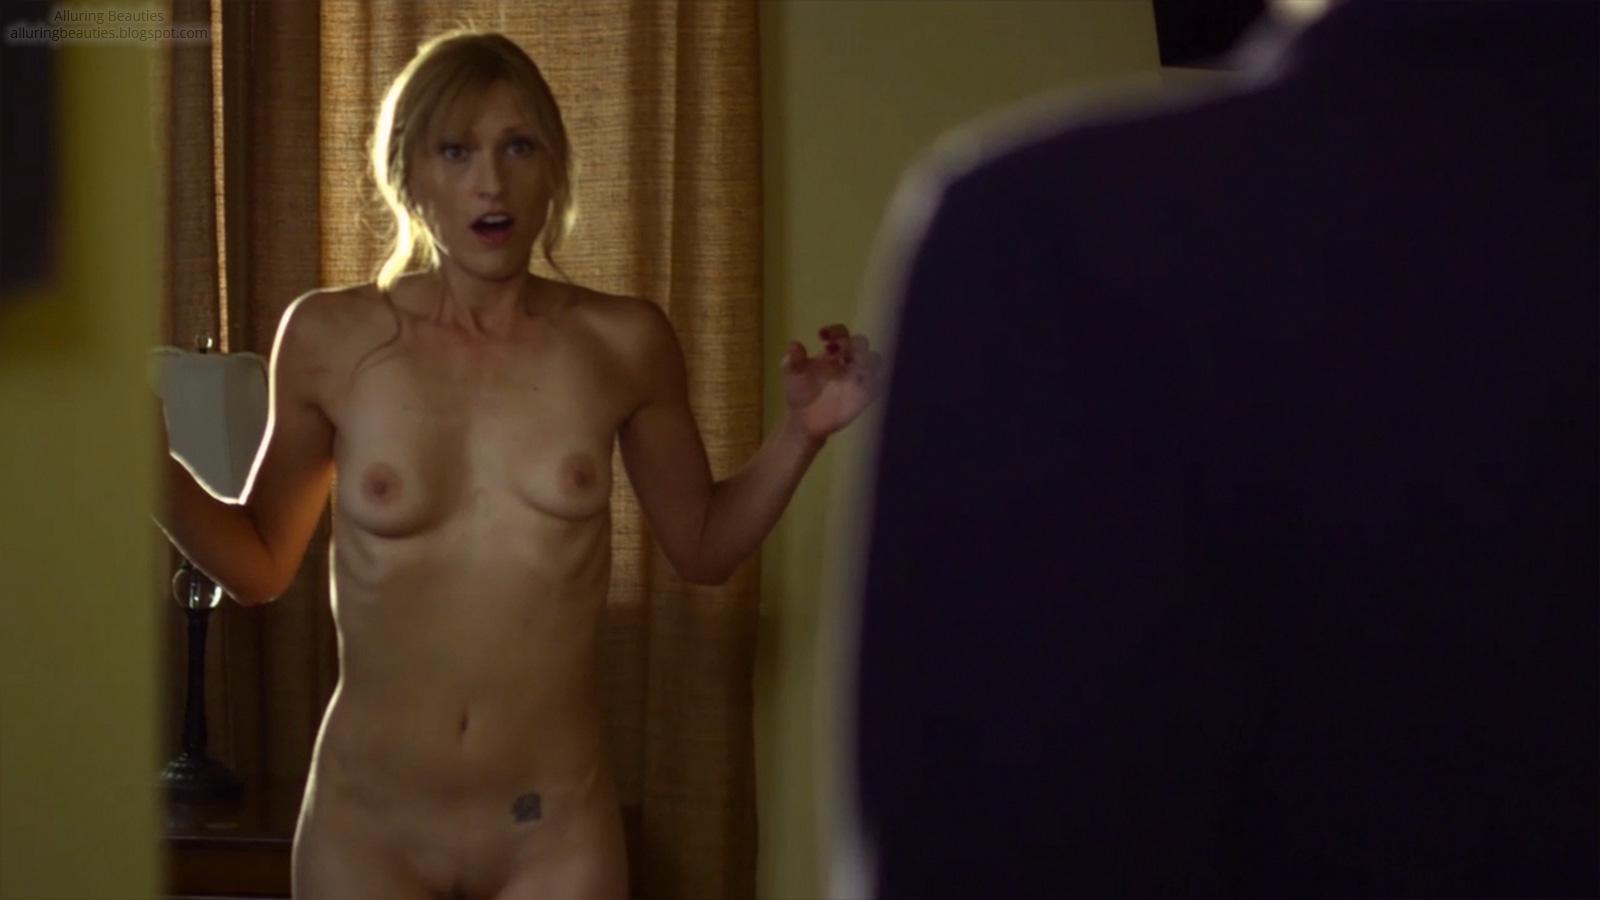 christina model with big boobs